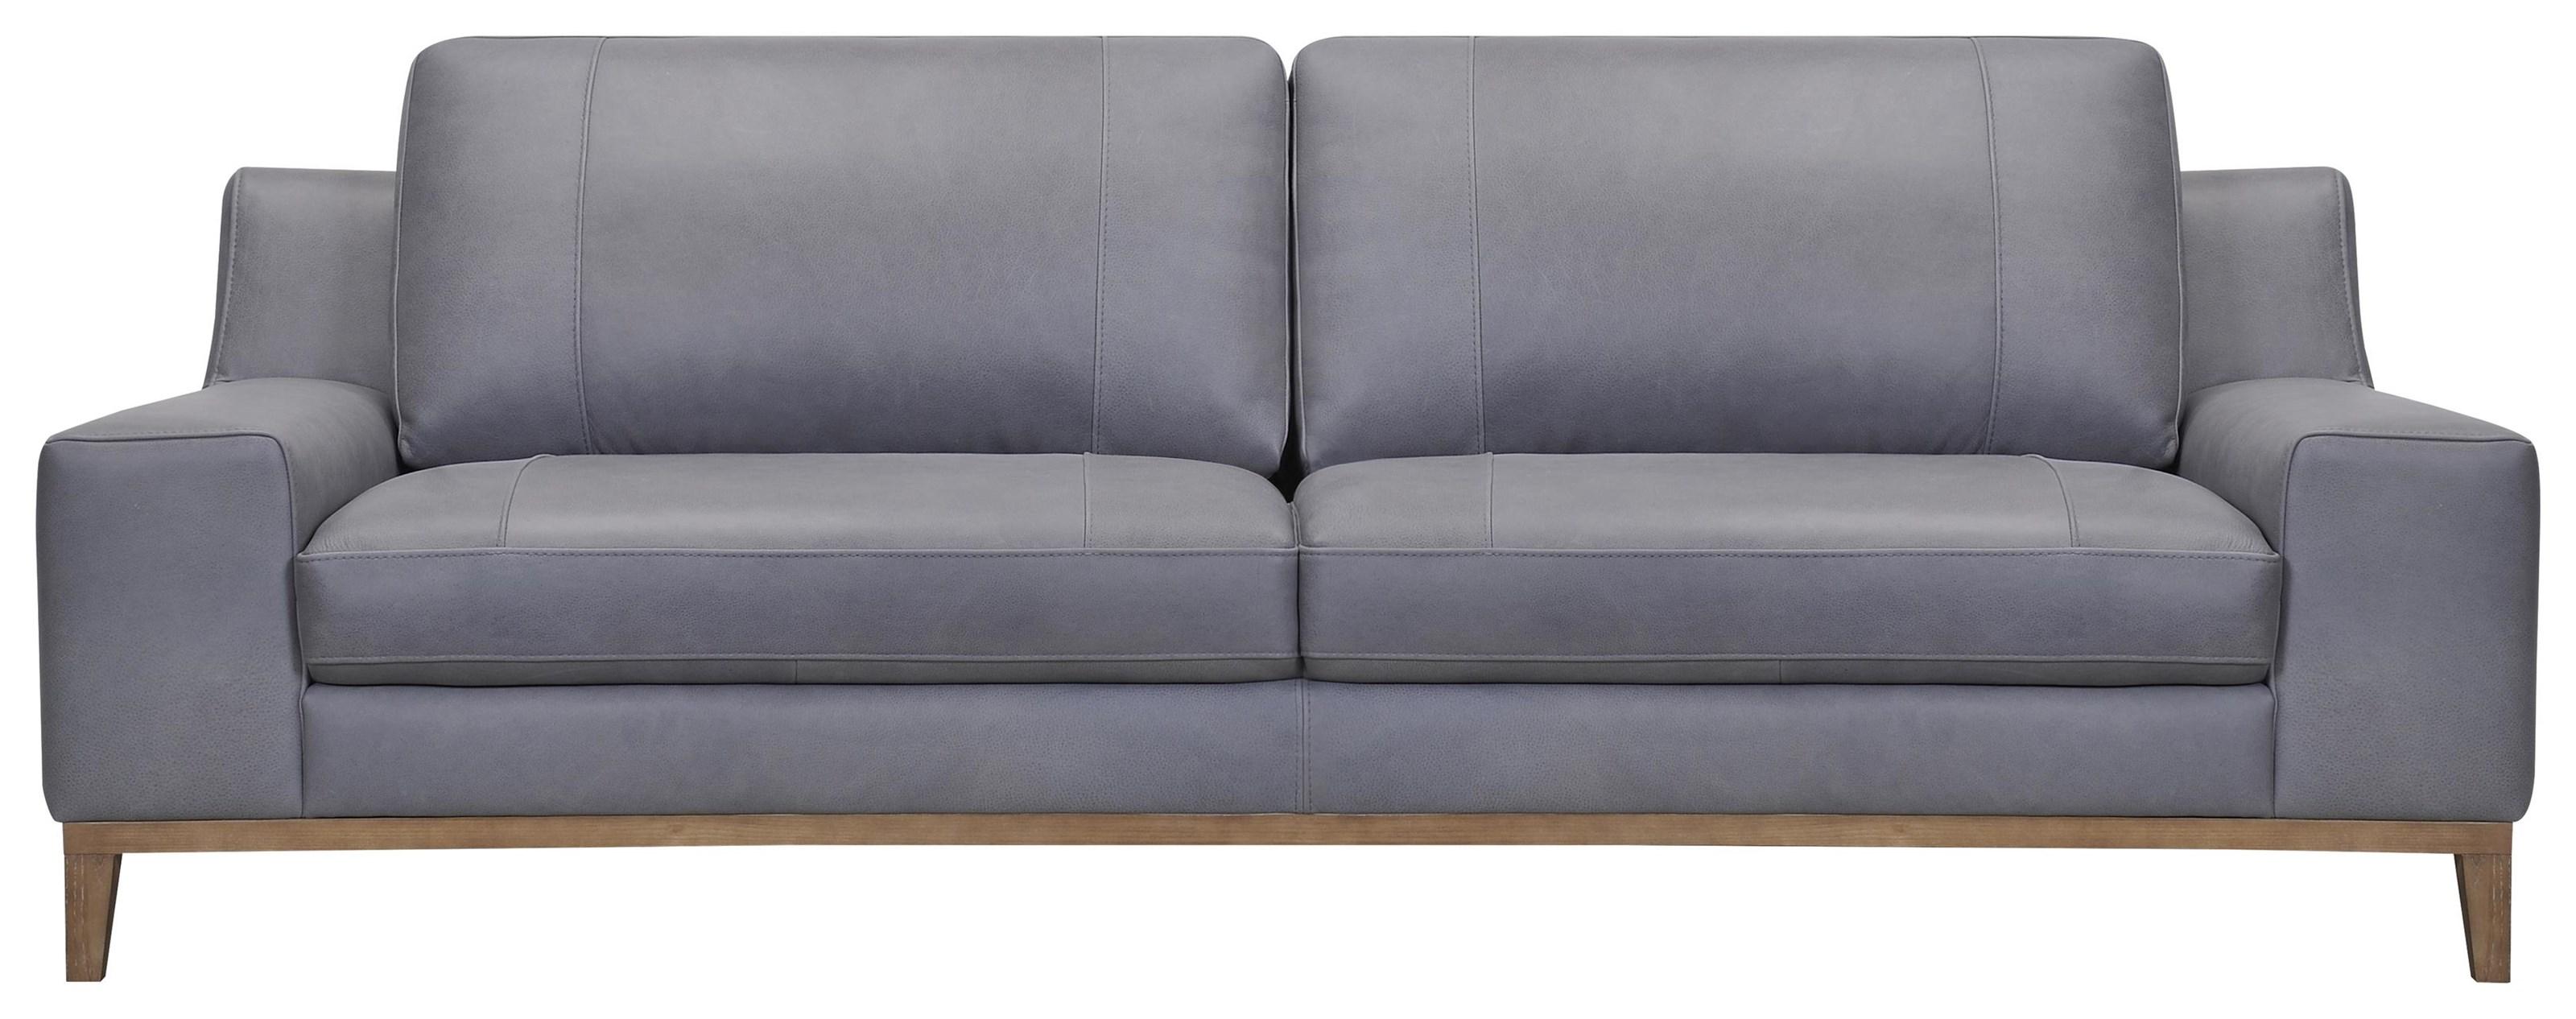 32924 Zen Ice Sofa by Violino at Stoney Creek Furniture